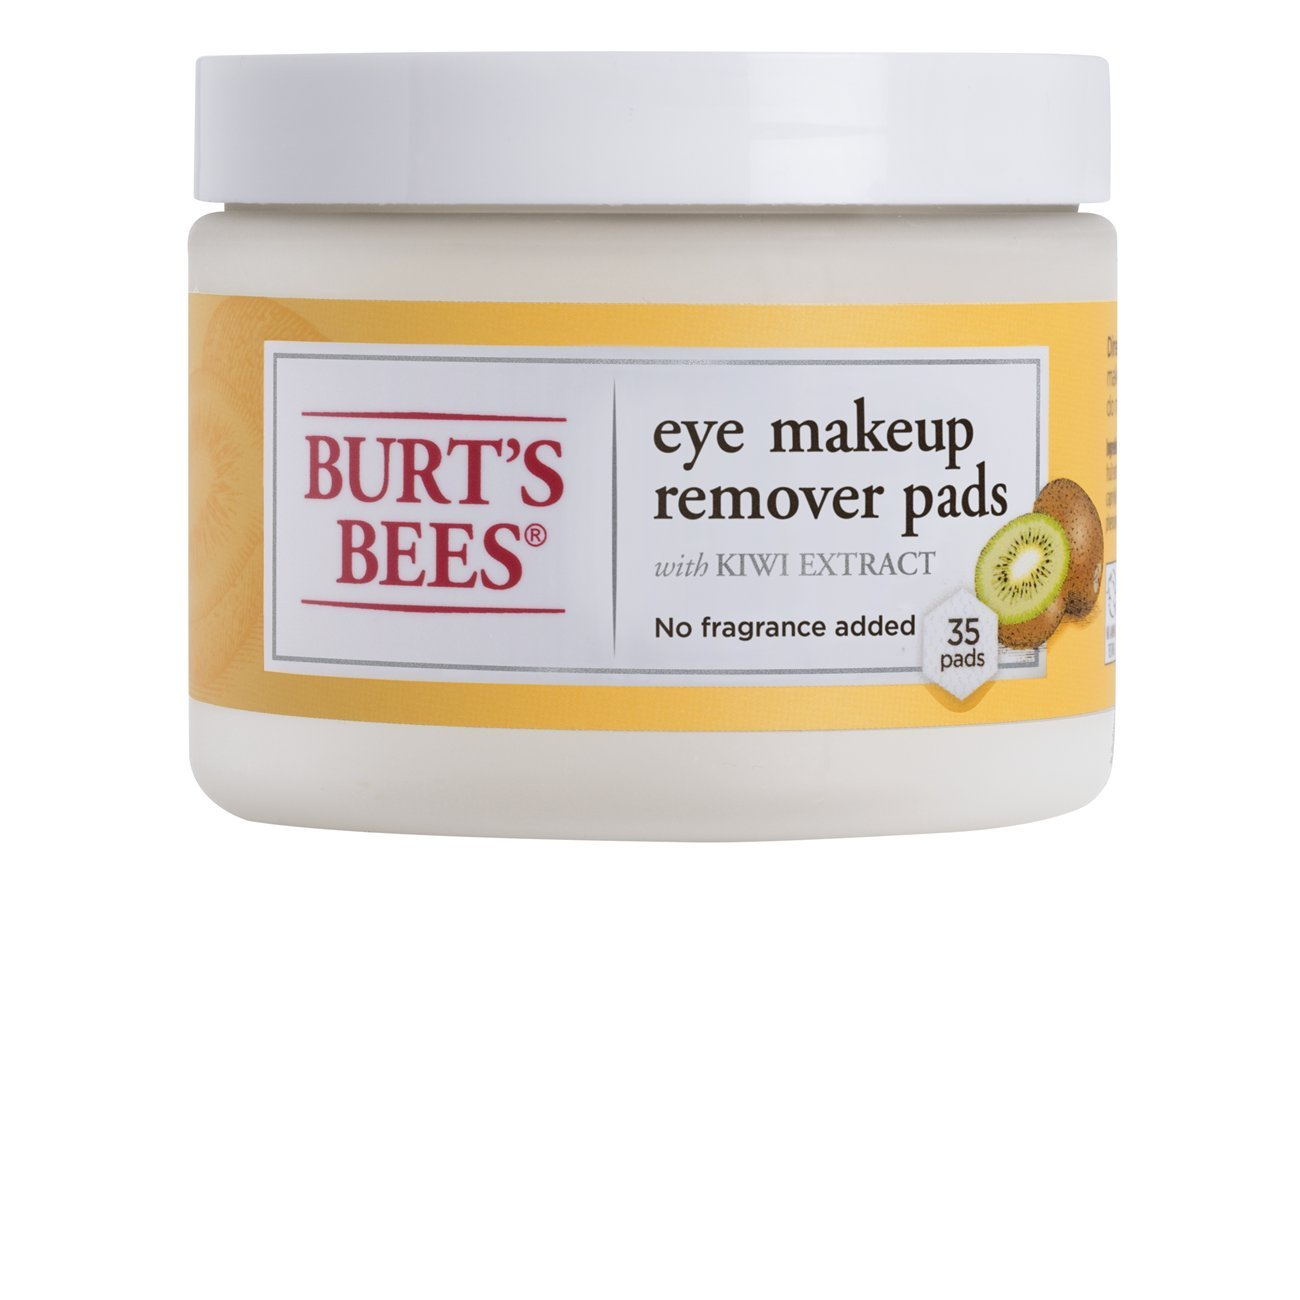 Burt's Bees Eye Makeup Remover Pads, 35 Count Burt' s Bees Inc.